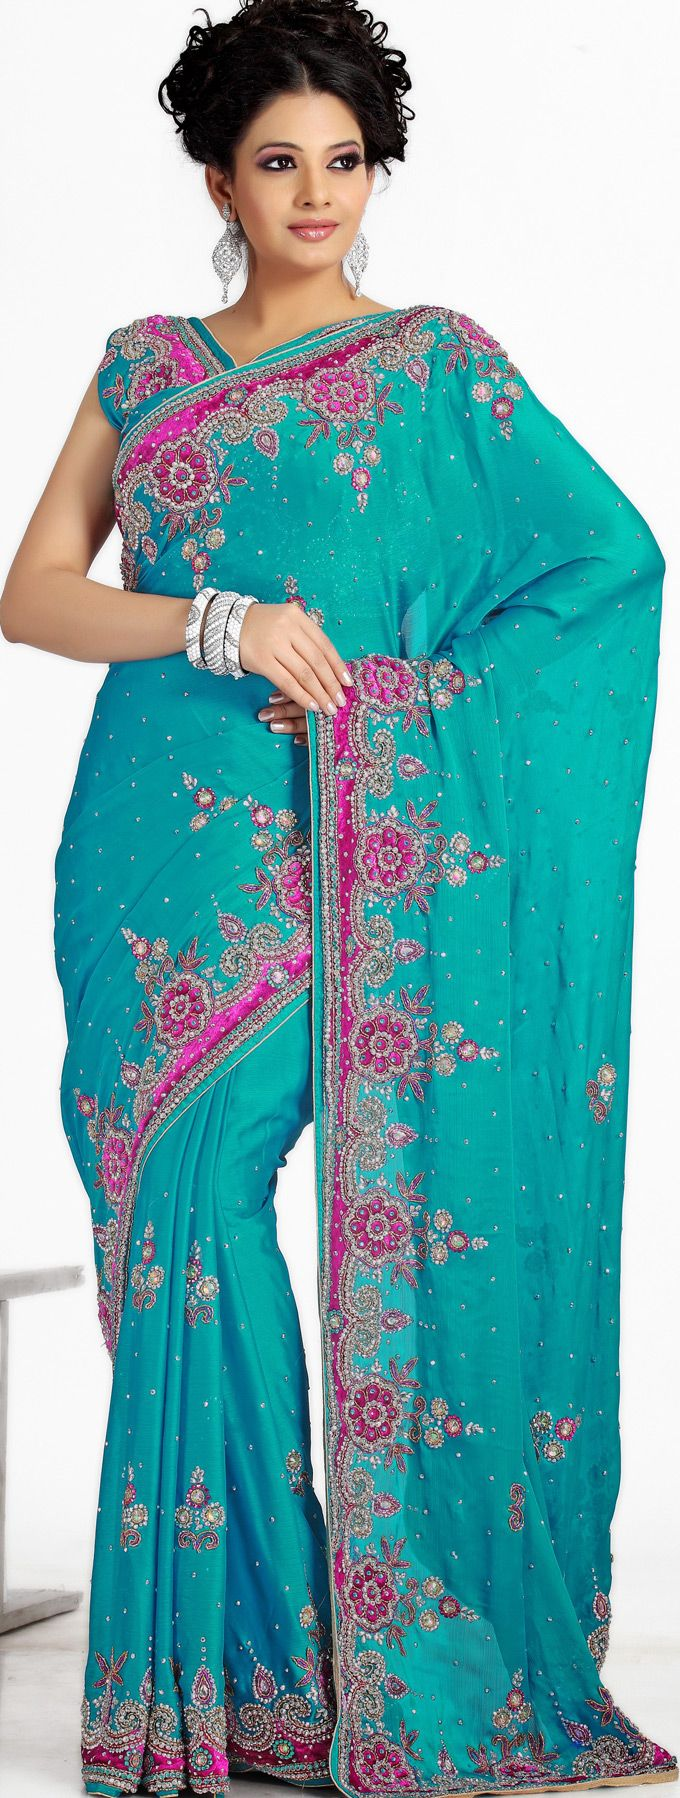 Dodger Blue Chiffon #Indian #Wedding #Saree | @ $264.33